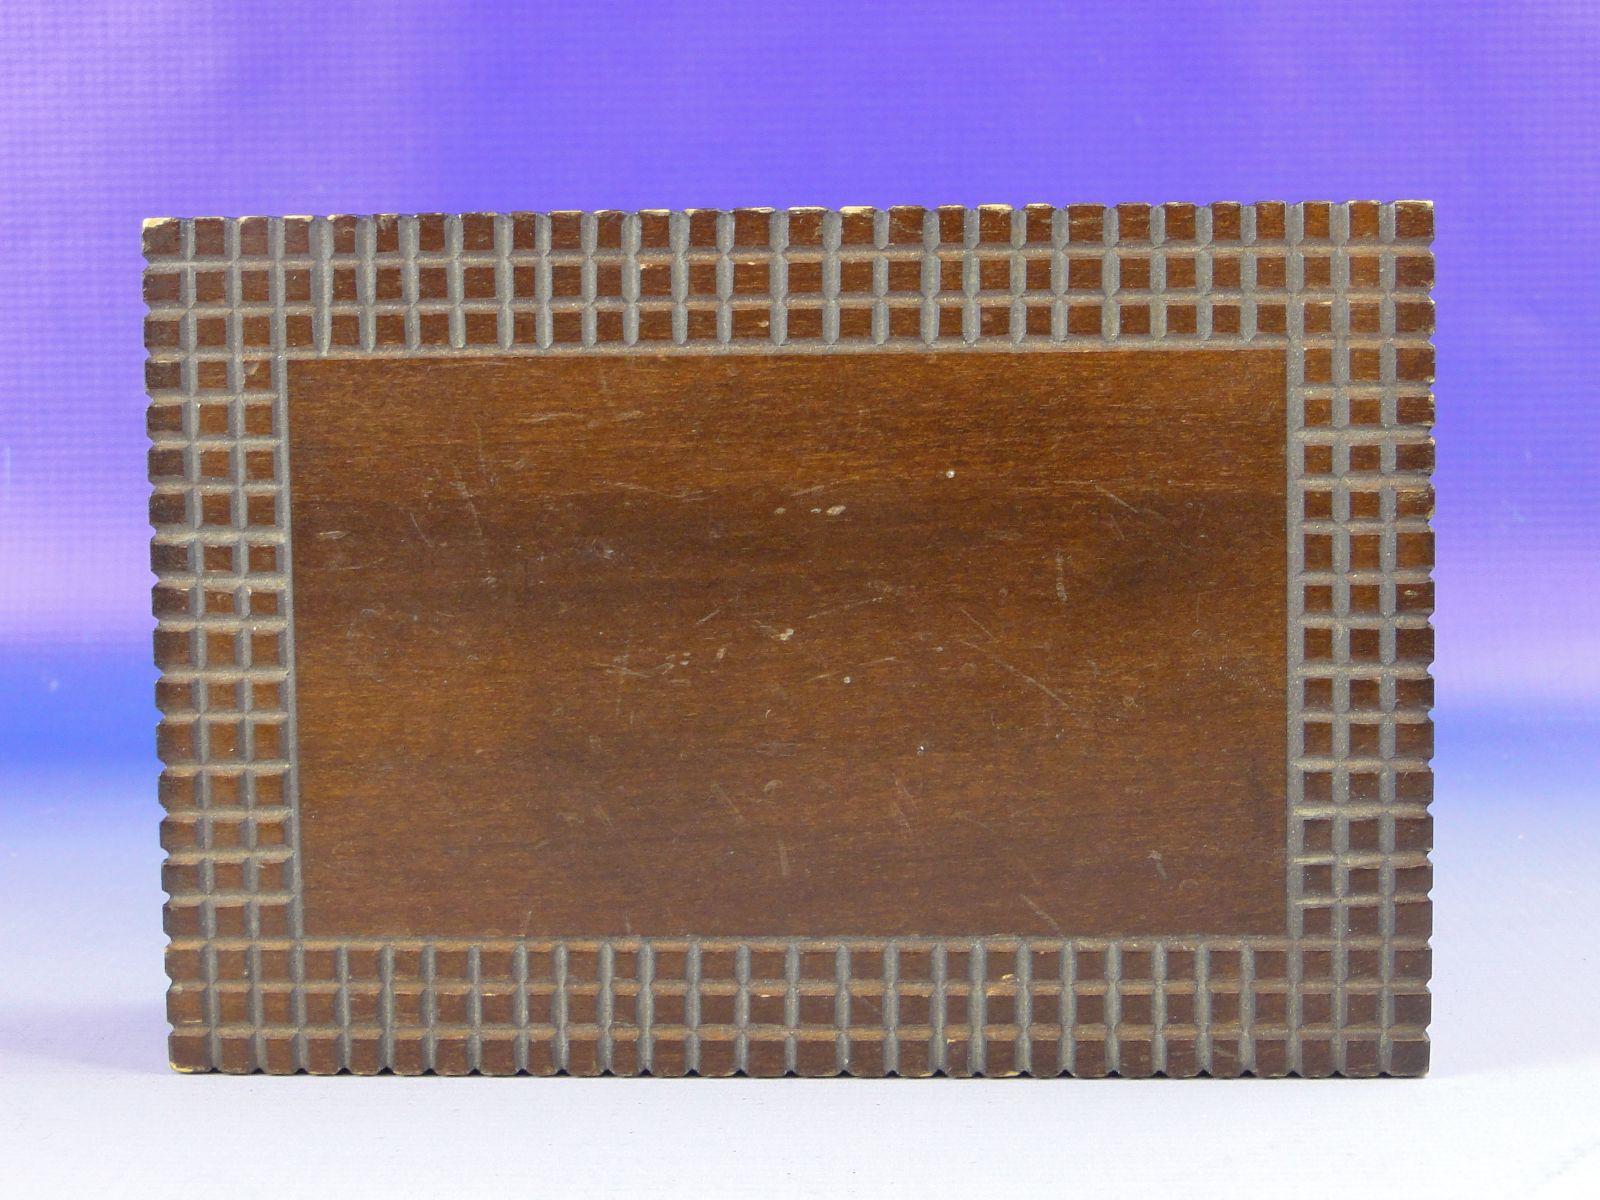 DSC09545.JPG (1600×1200)